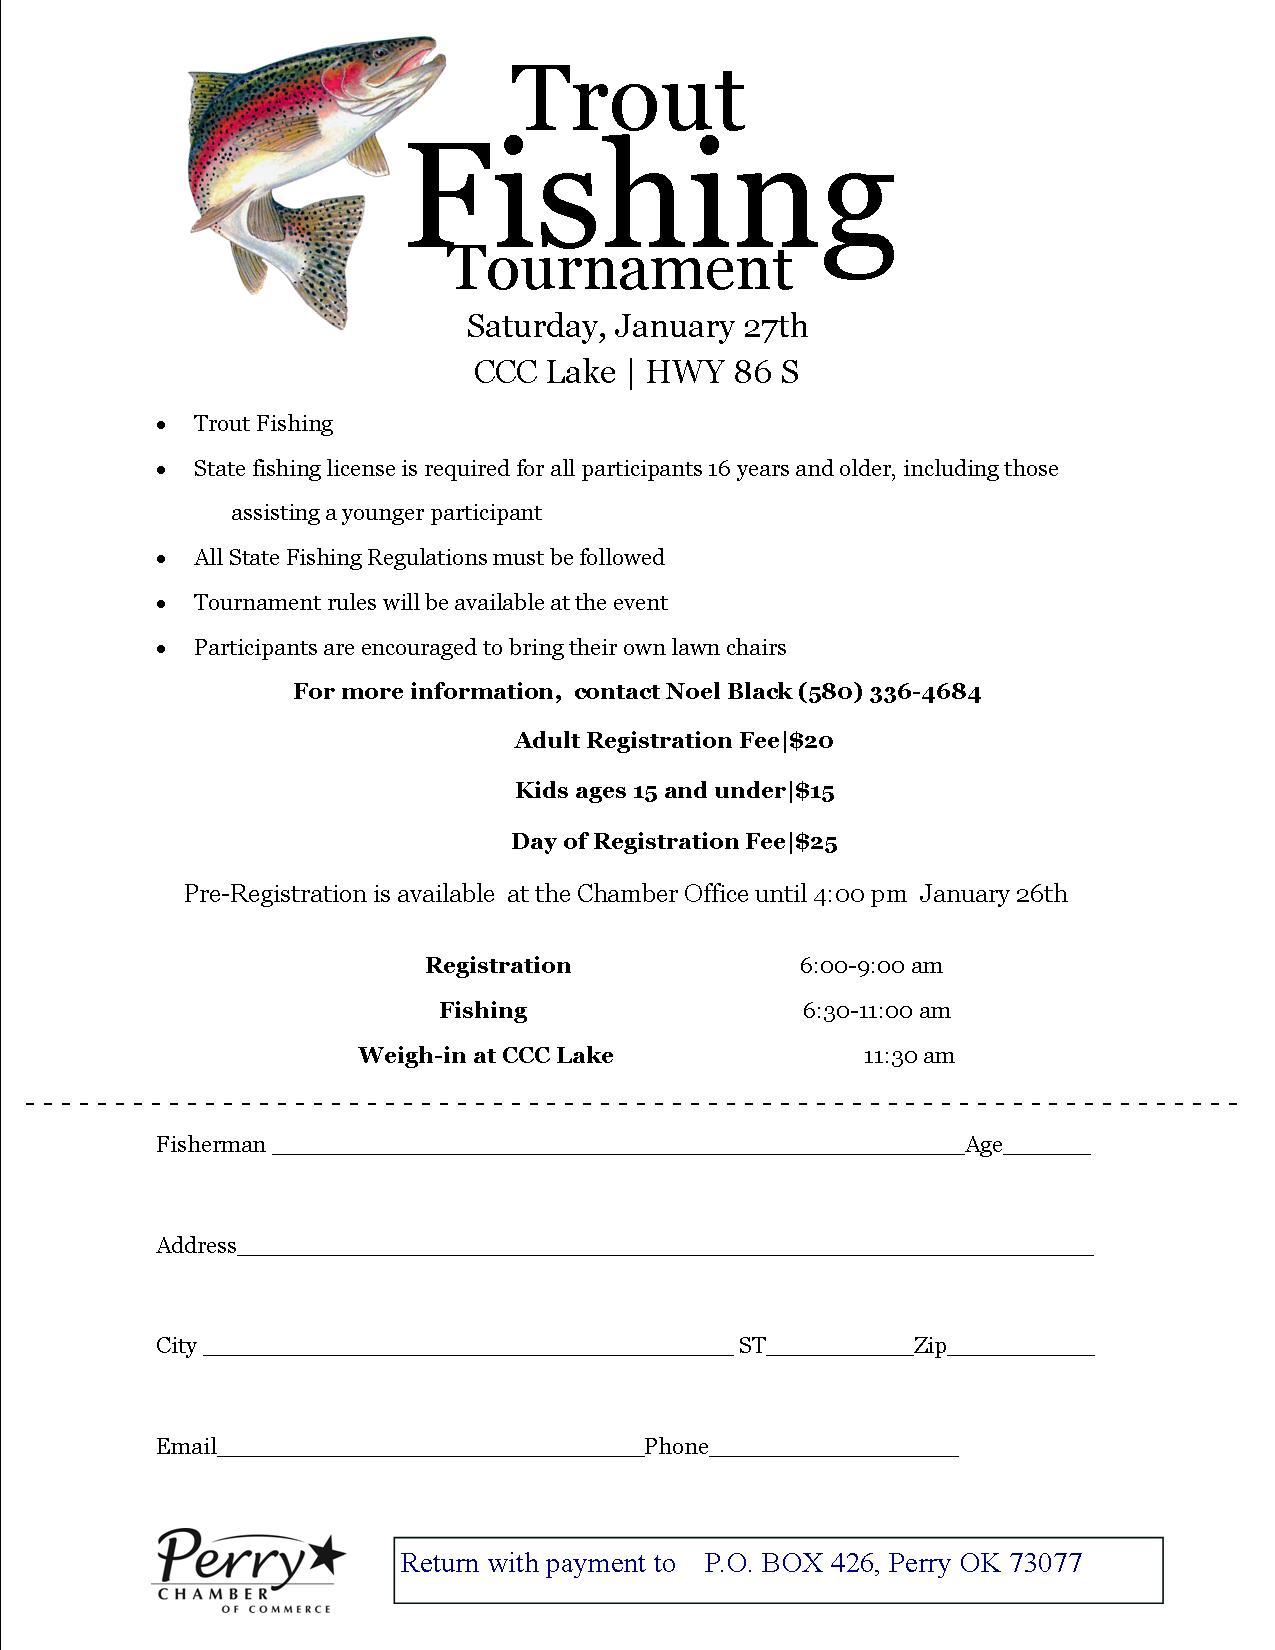 Fishing Tournament Registration